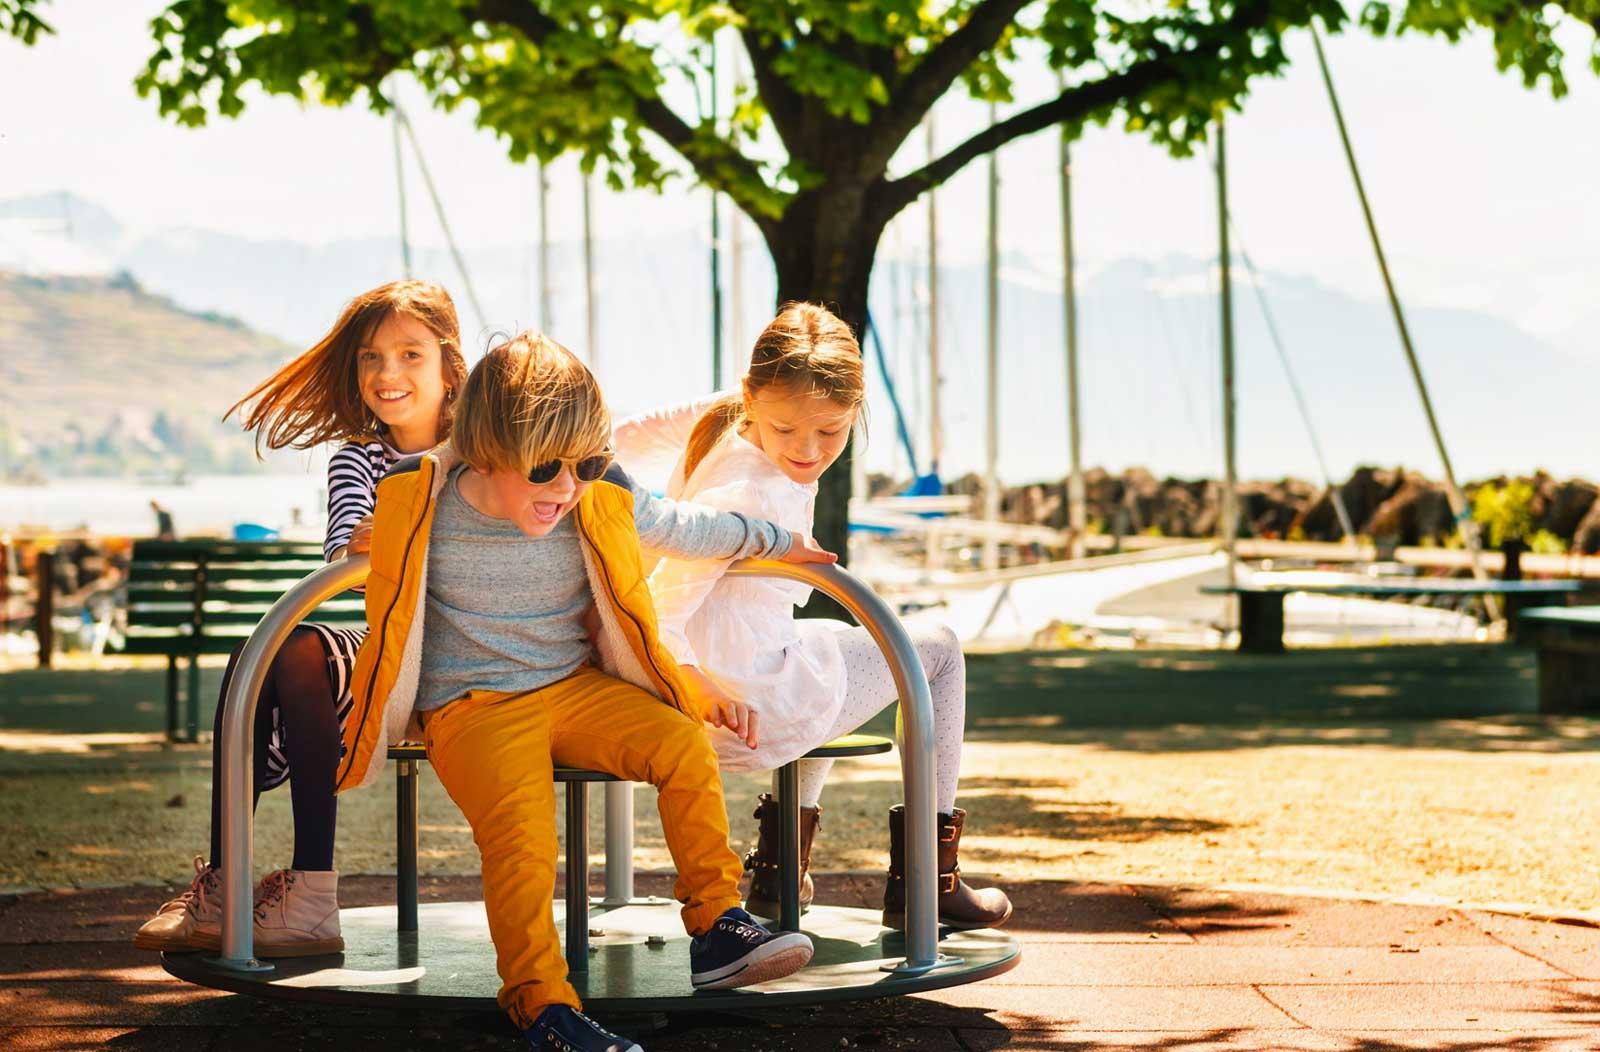 three kids playing on a playground